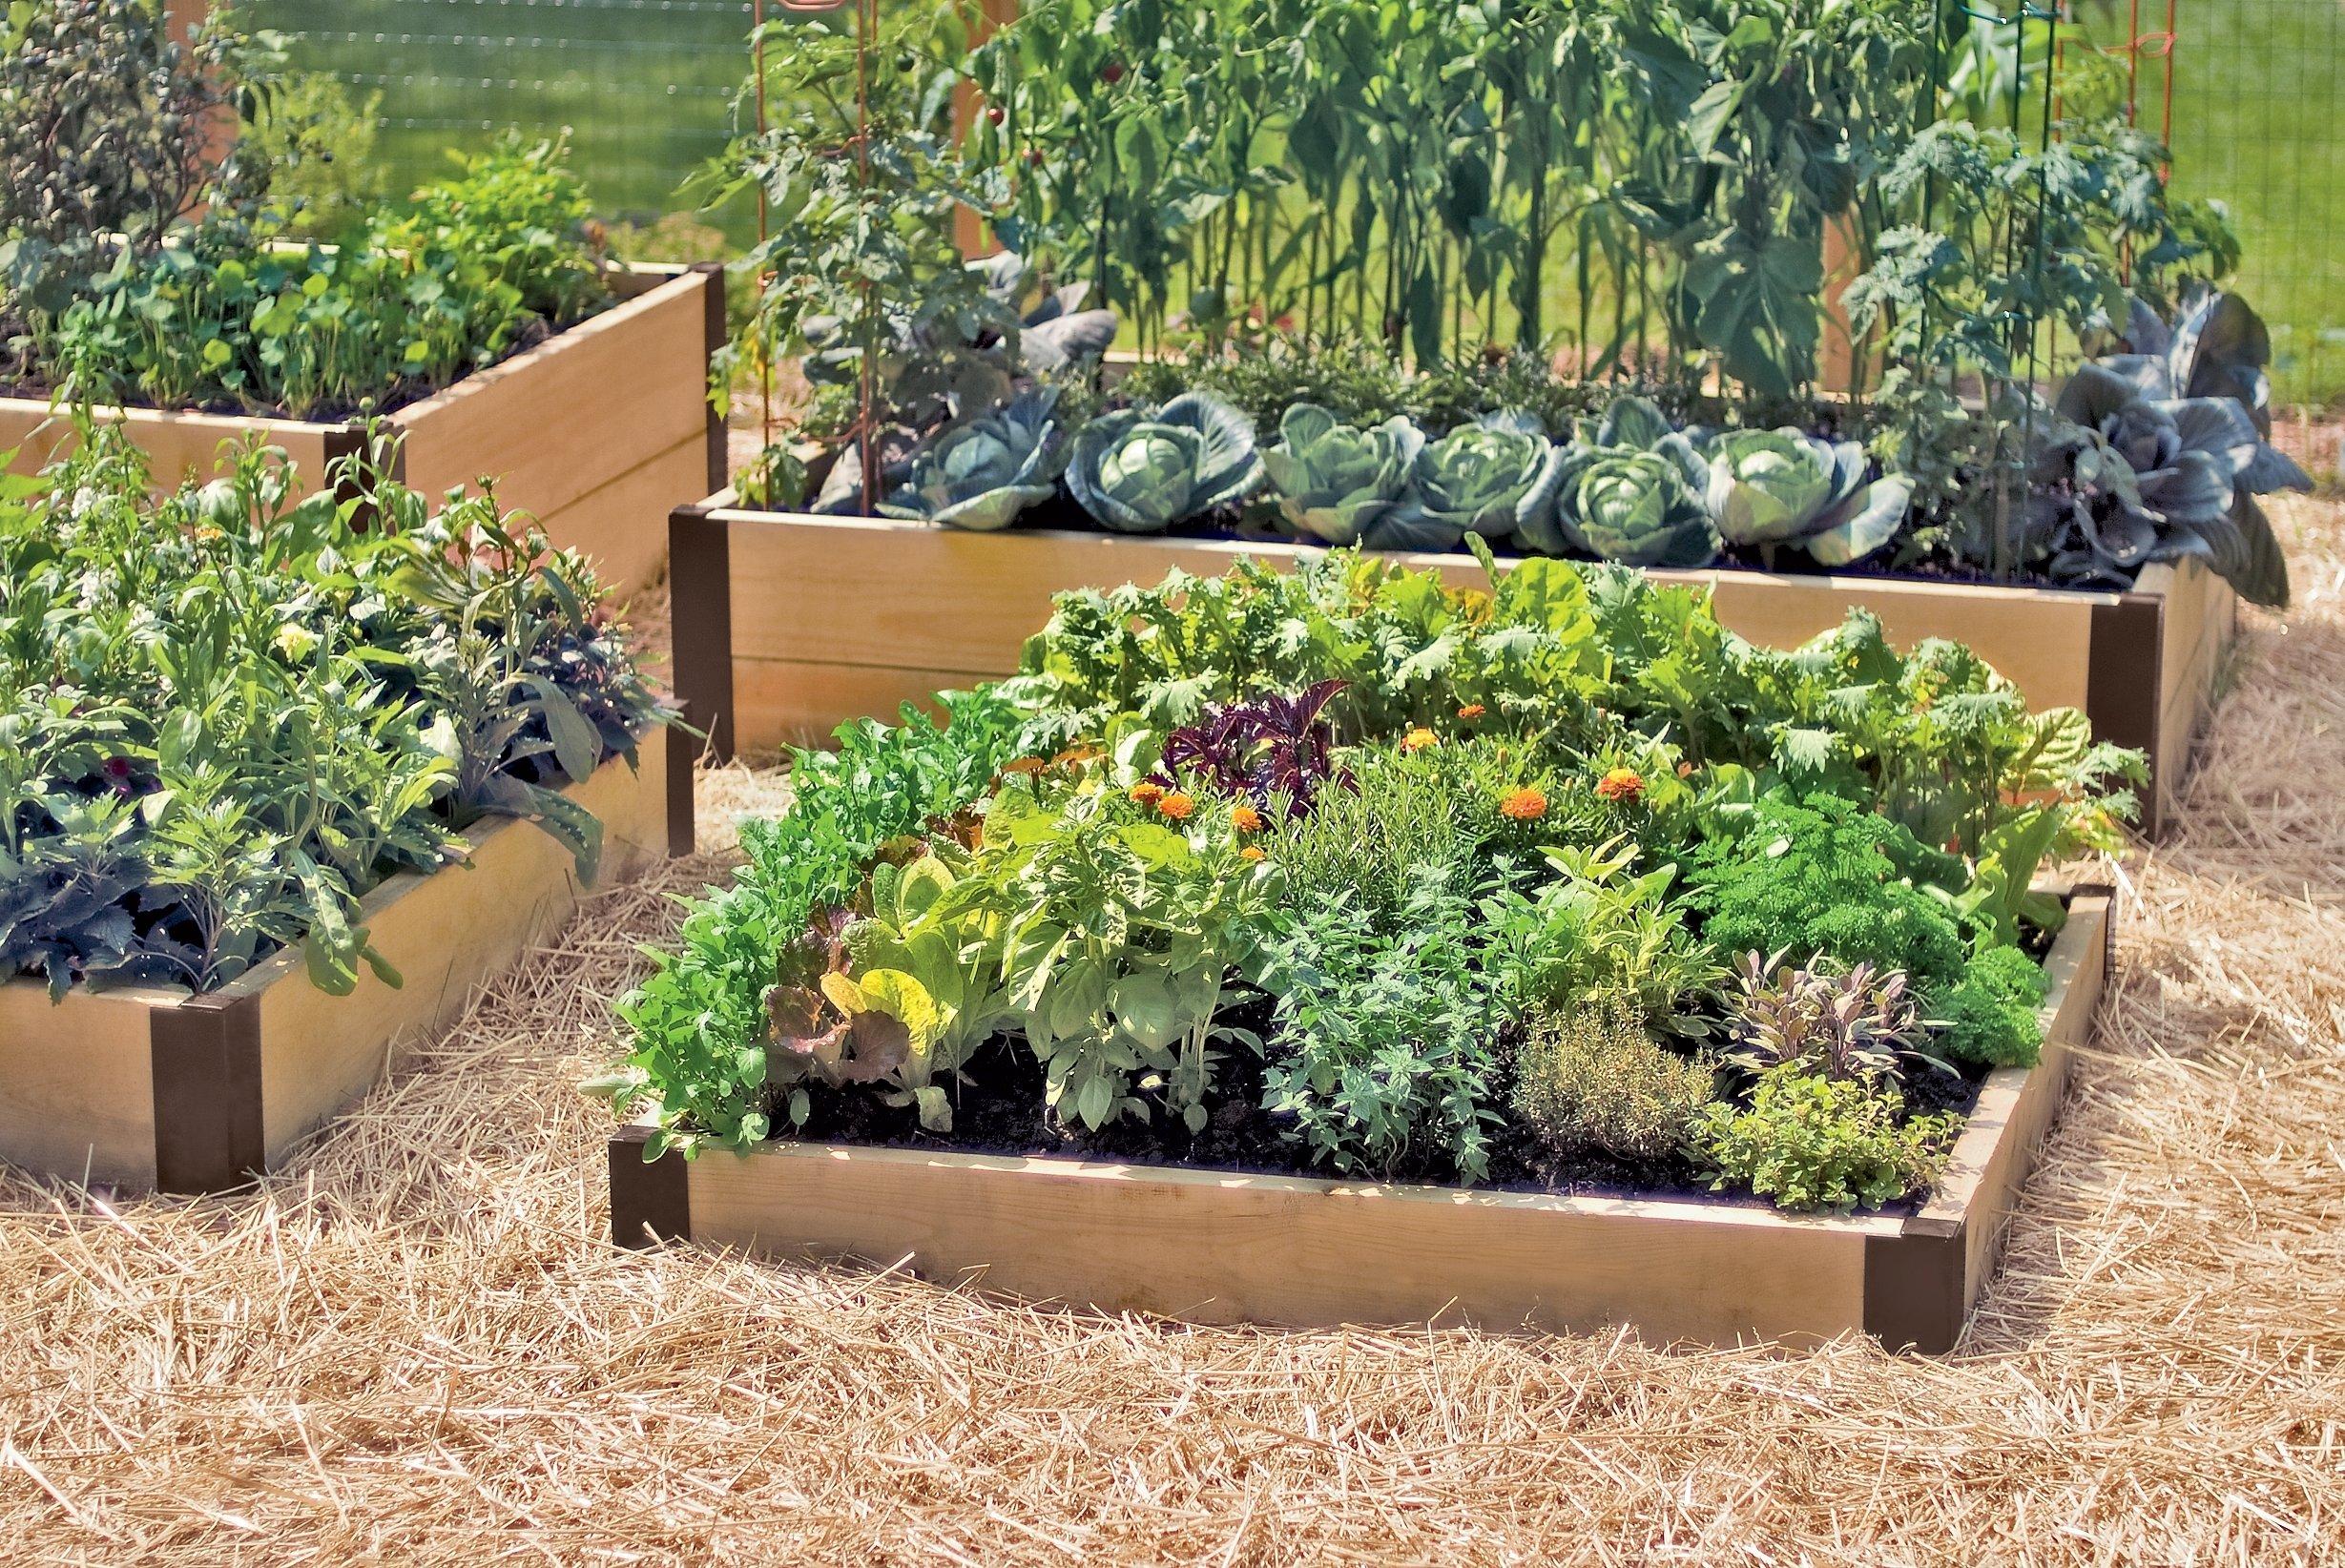 10 Unique Raised Bed Garden Design Ideas small wood diy raised bed designs vegetable gardens ideas with straw 2021